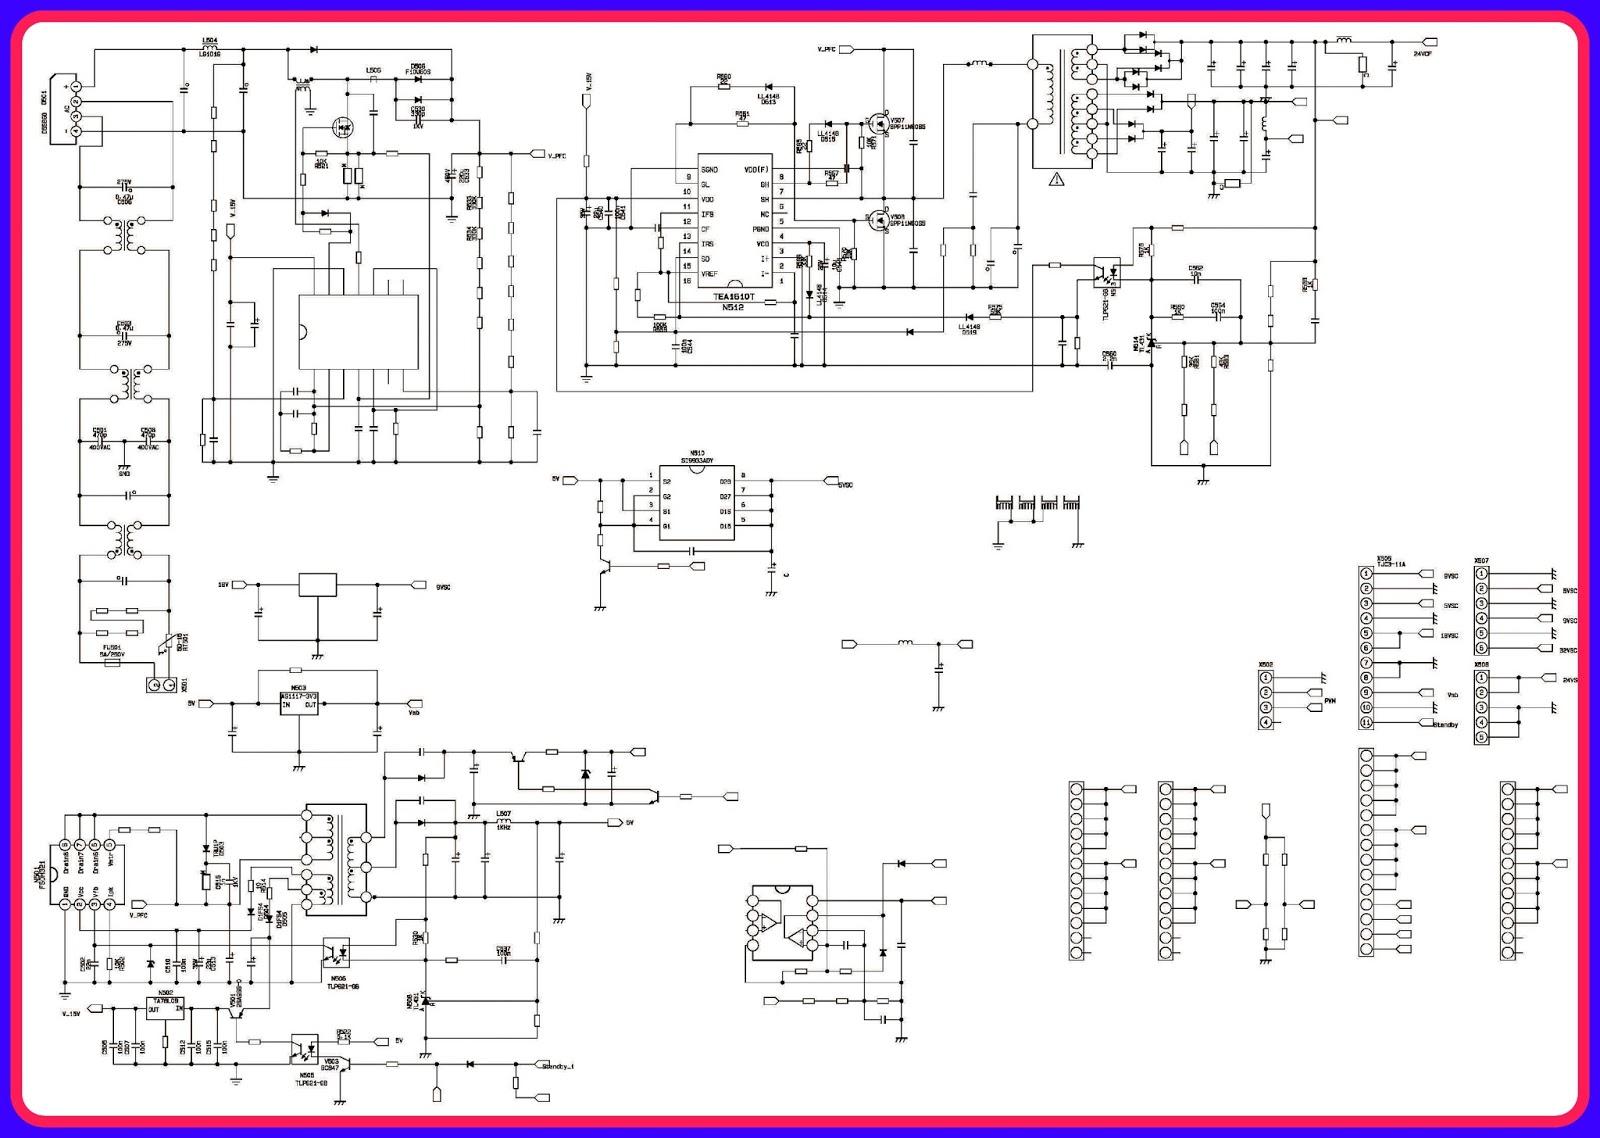 SANYO%2BLCD 42XR7H%2BPOWER electronic equipment repair centre sanyo lcd 42xr7h service